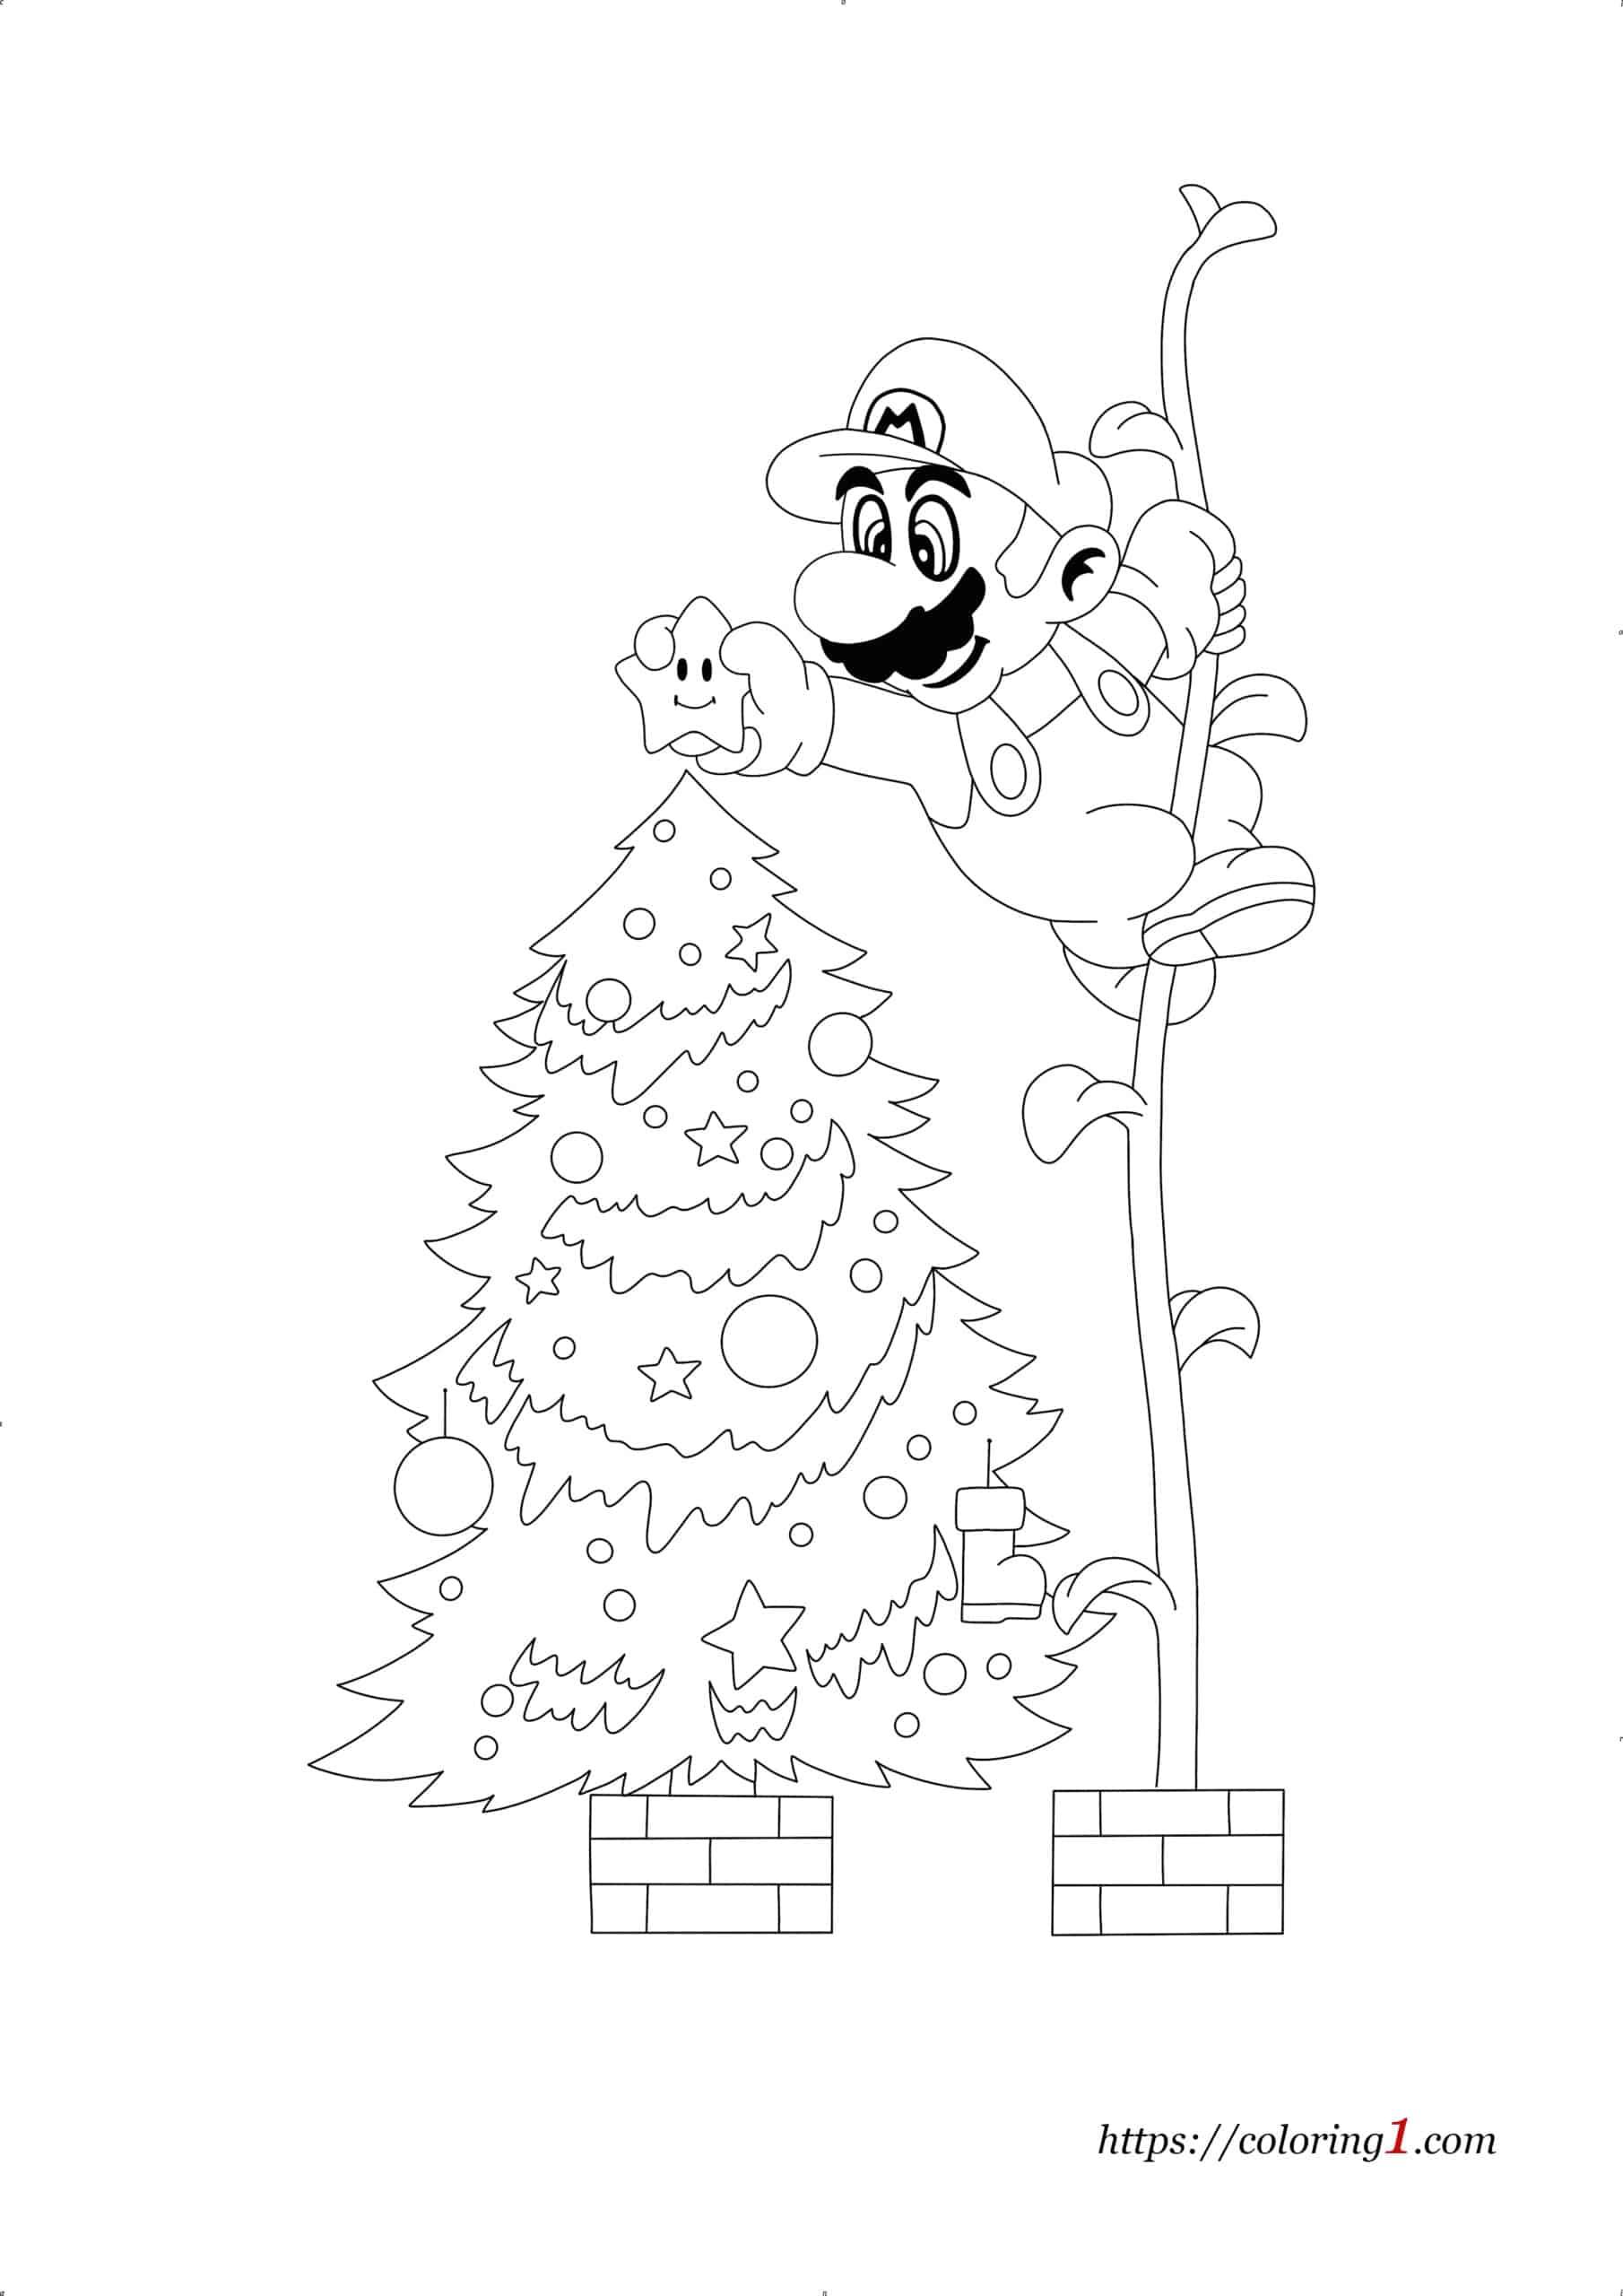 Mario Christmas free coloring page to print